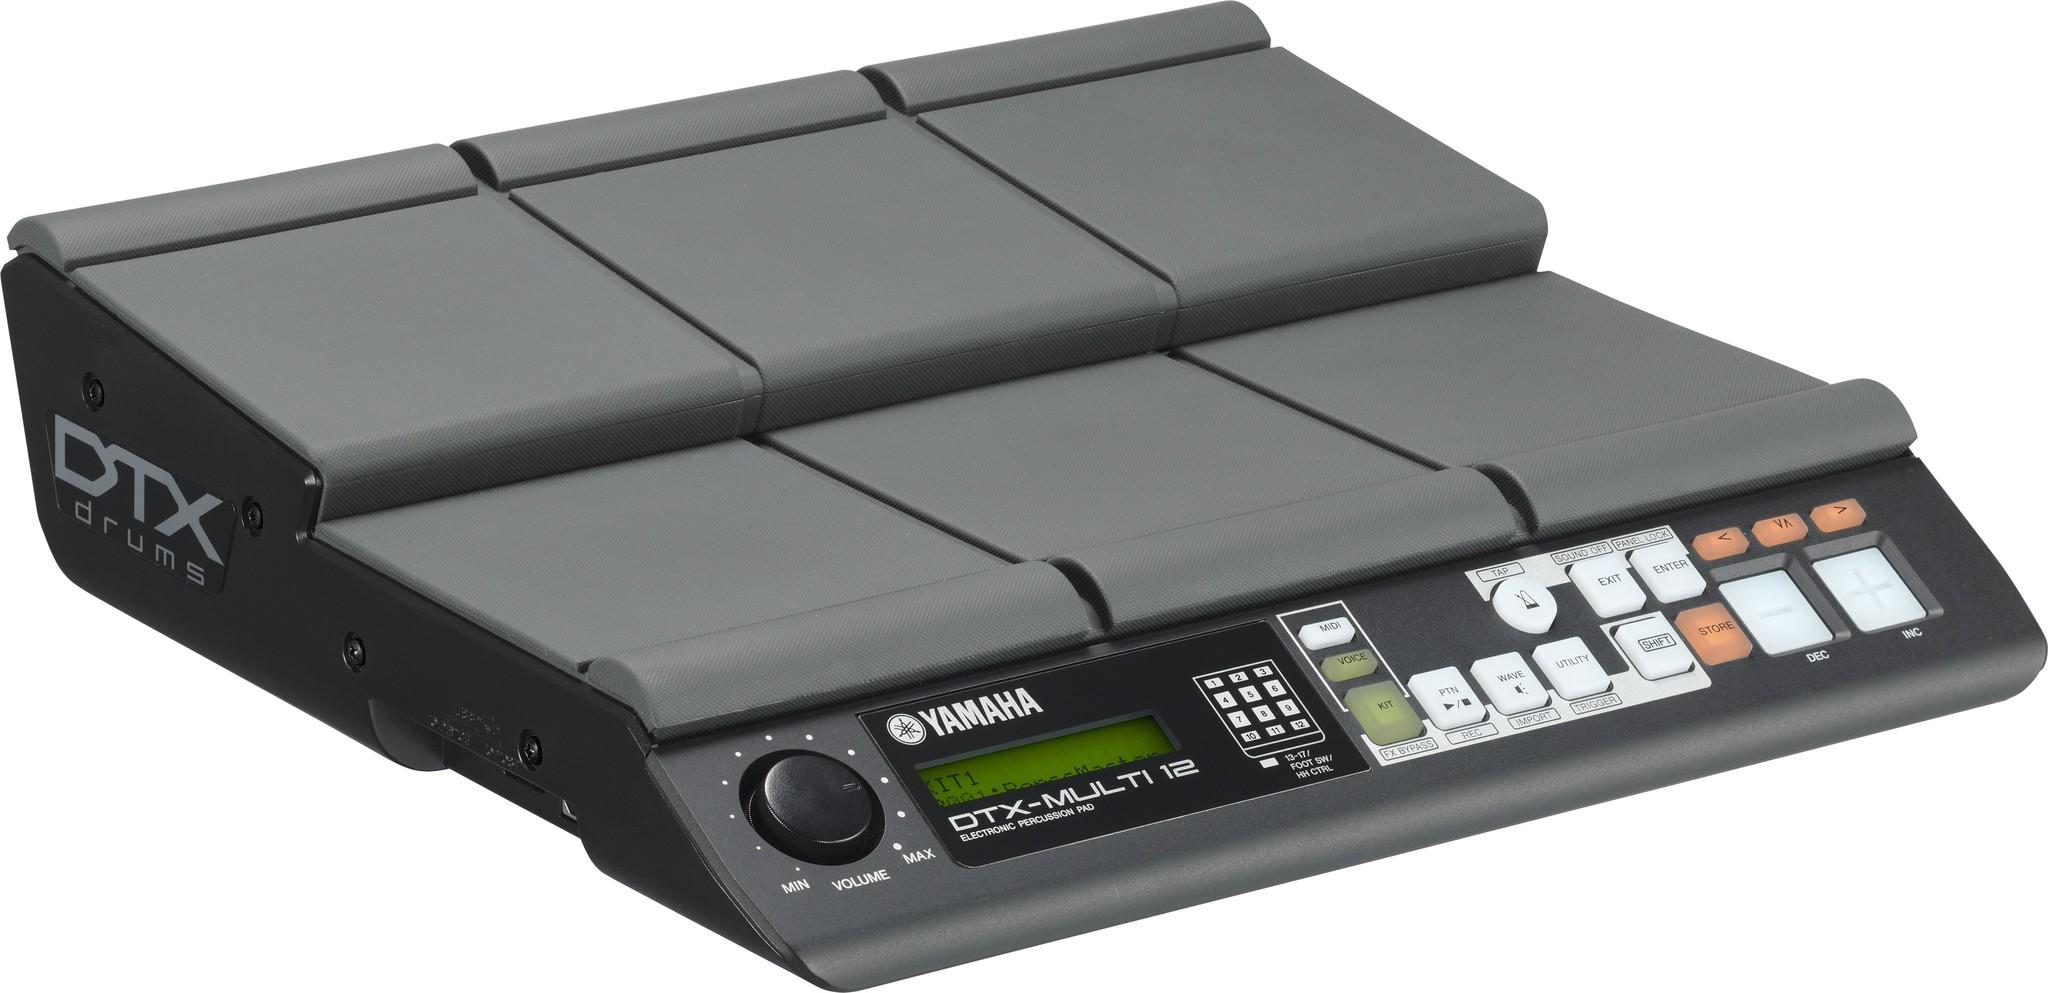 Yamaha Yamaha DTX M12 drum pad Ex demo special